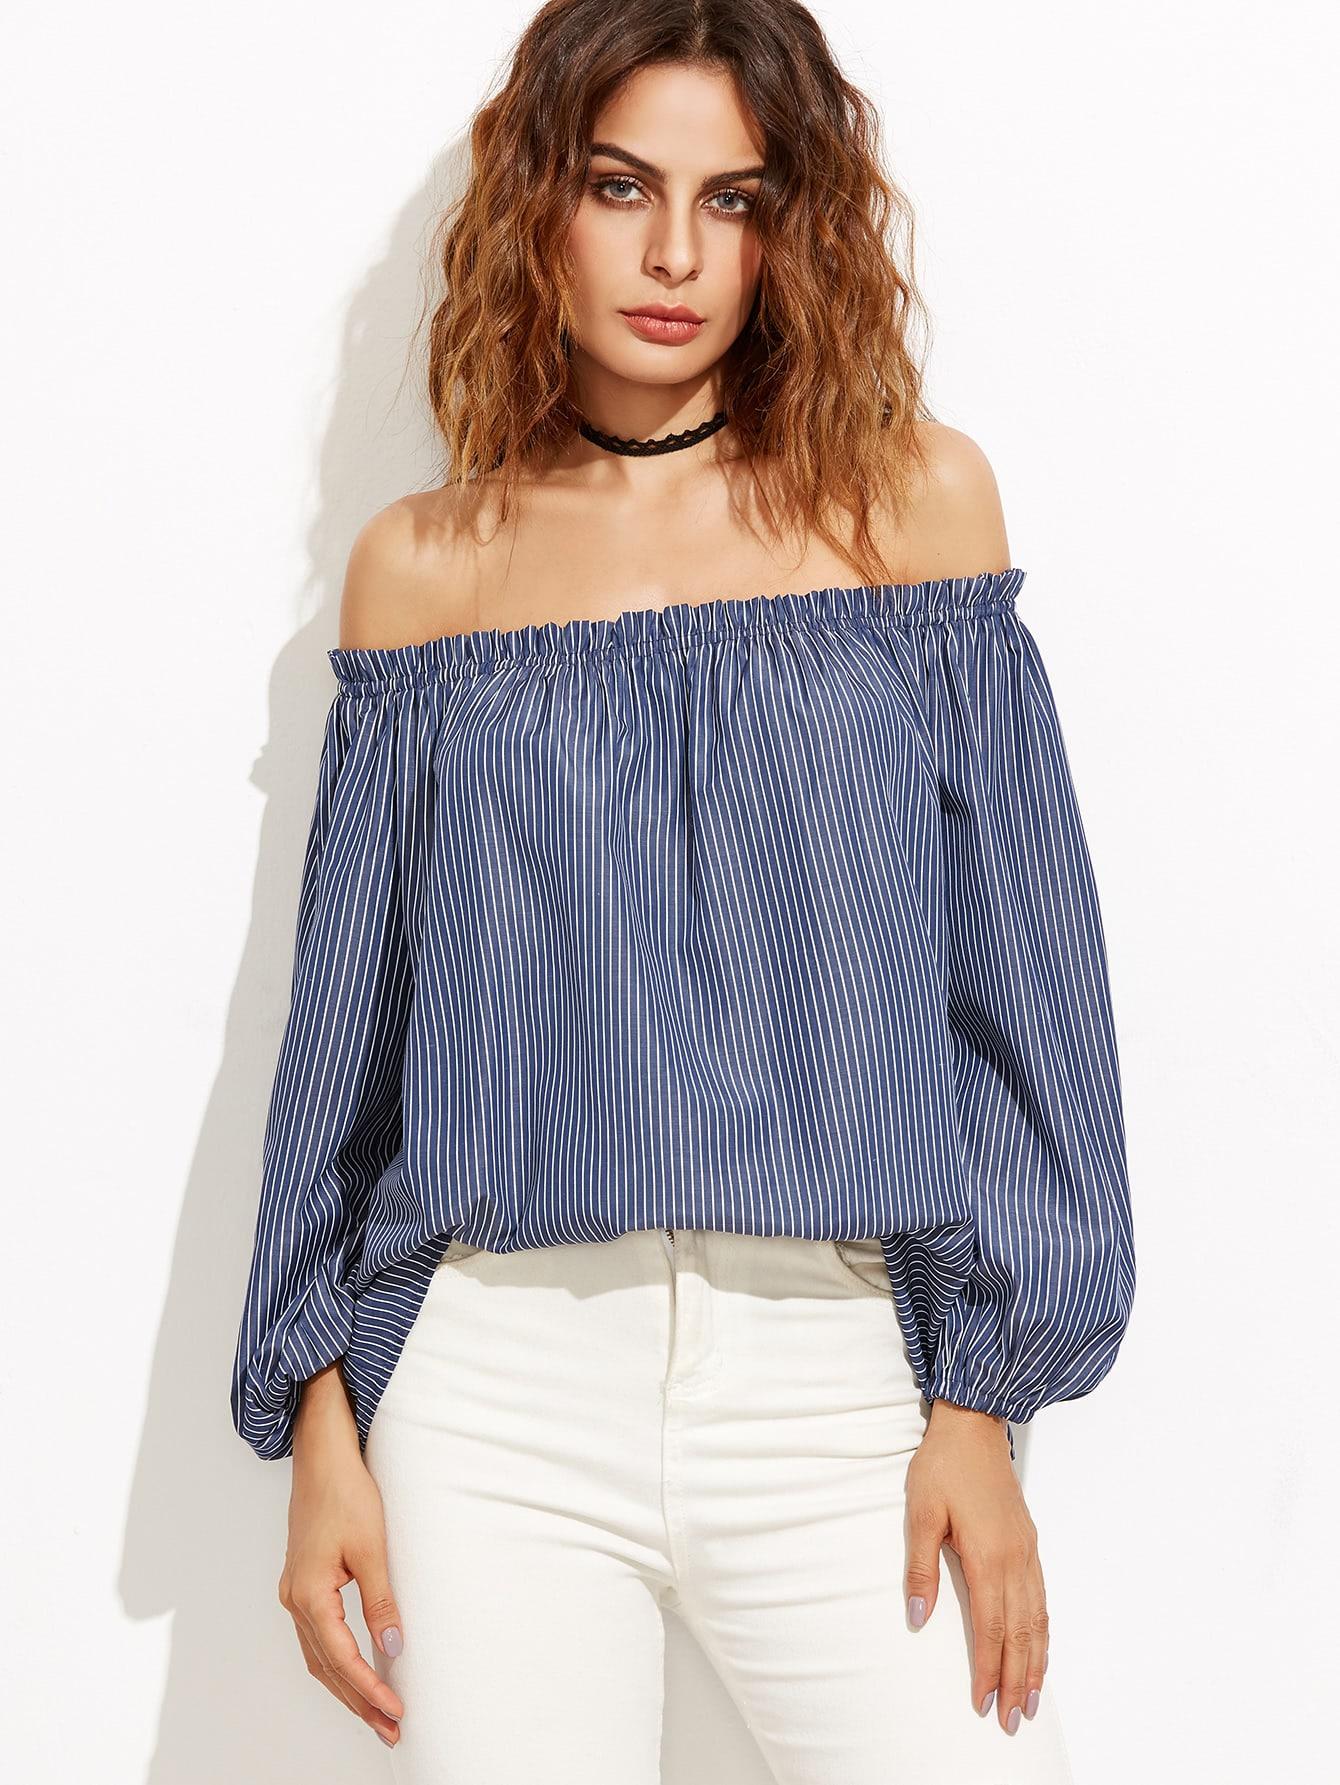 blouse160926701_3